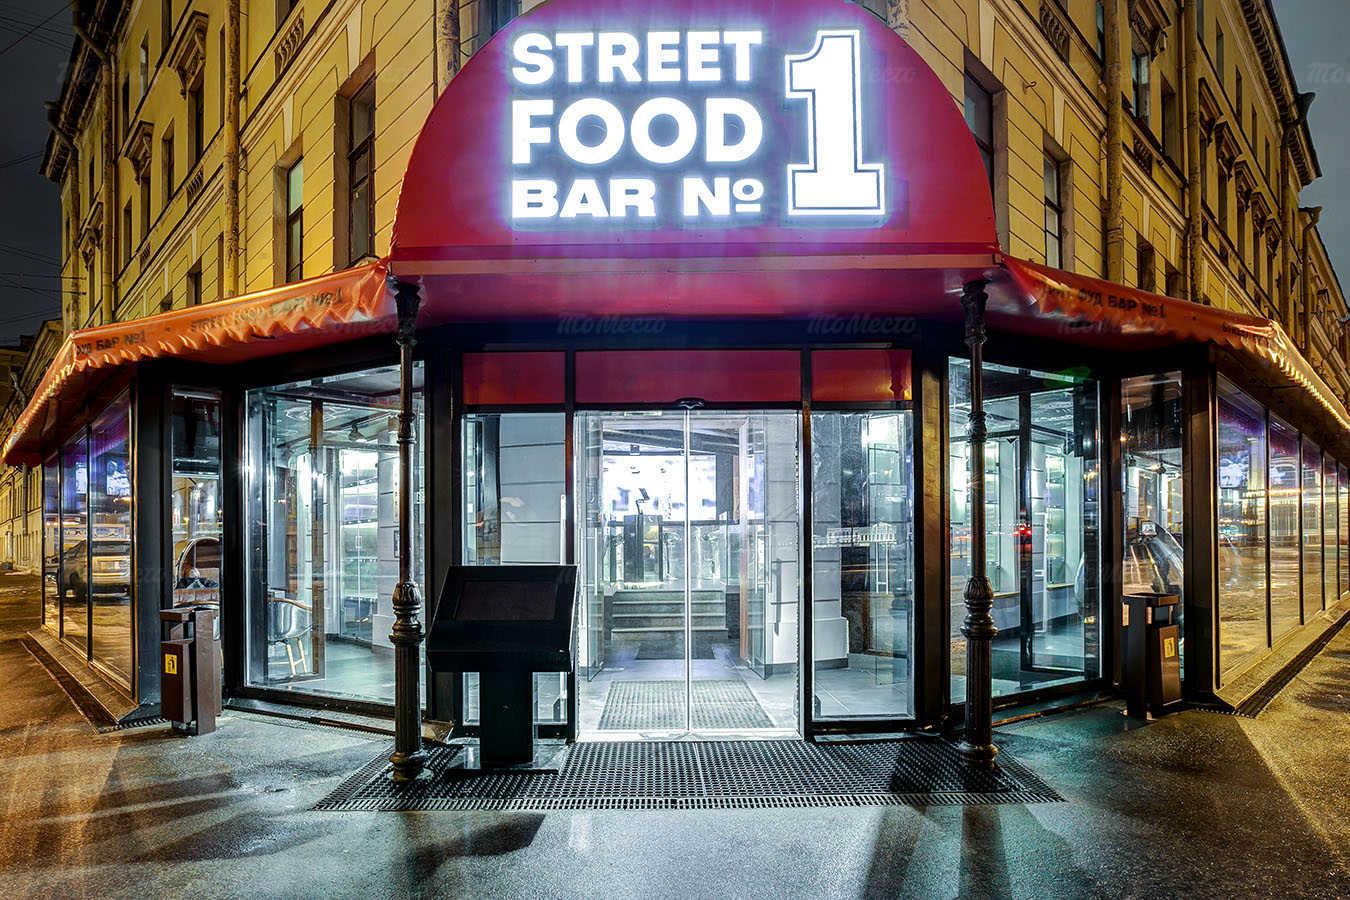 Ресторан Street food bar №1 (Стрит фуд бар №1) на Университетской набережной фото 6